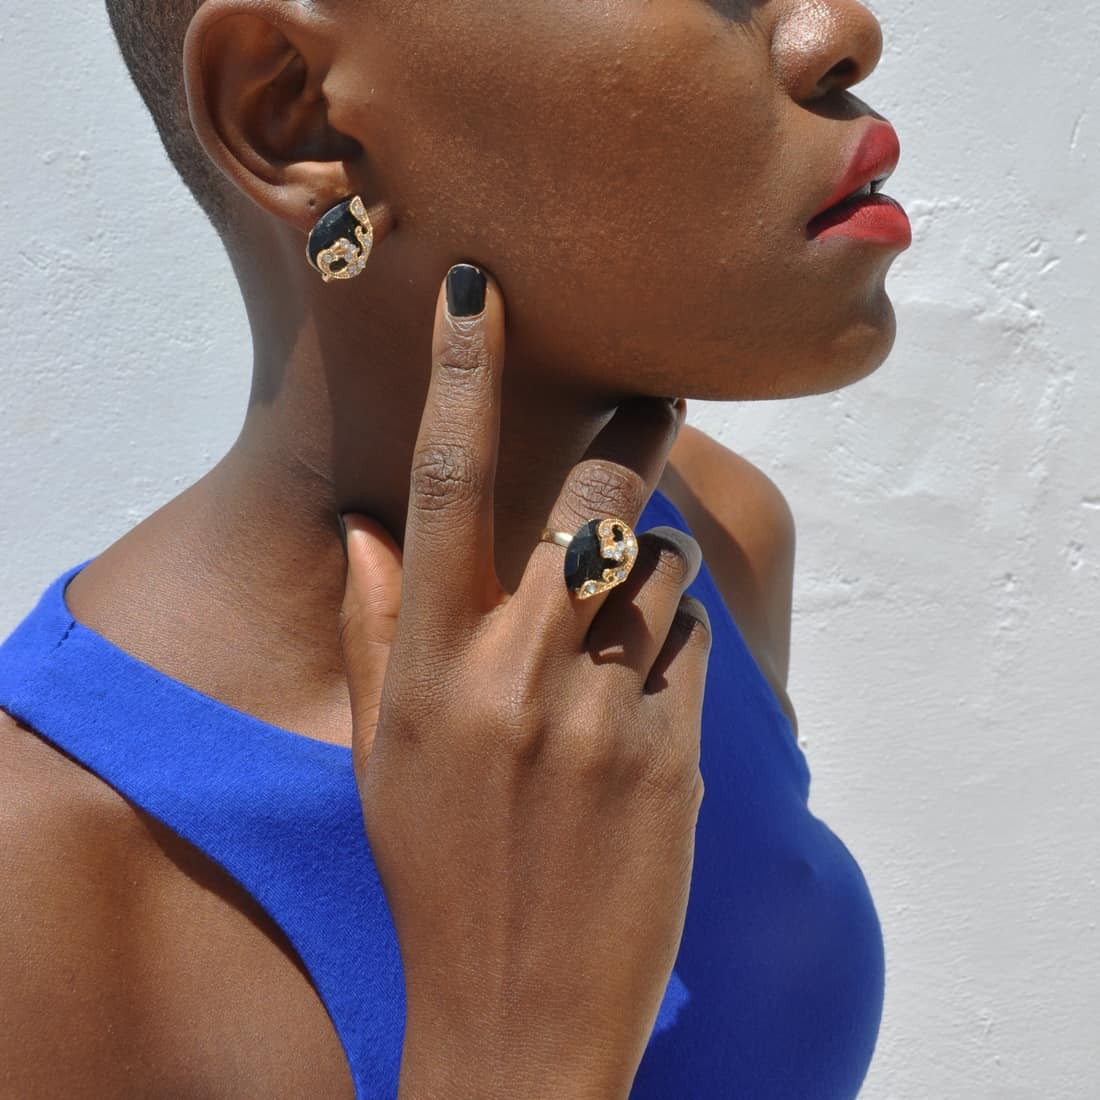 M0329 black5 Jewelry Accessories Jewelry Sets maureens.com boutique